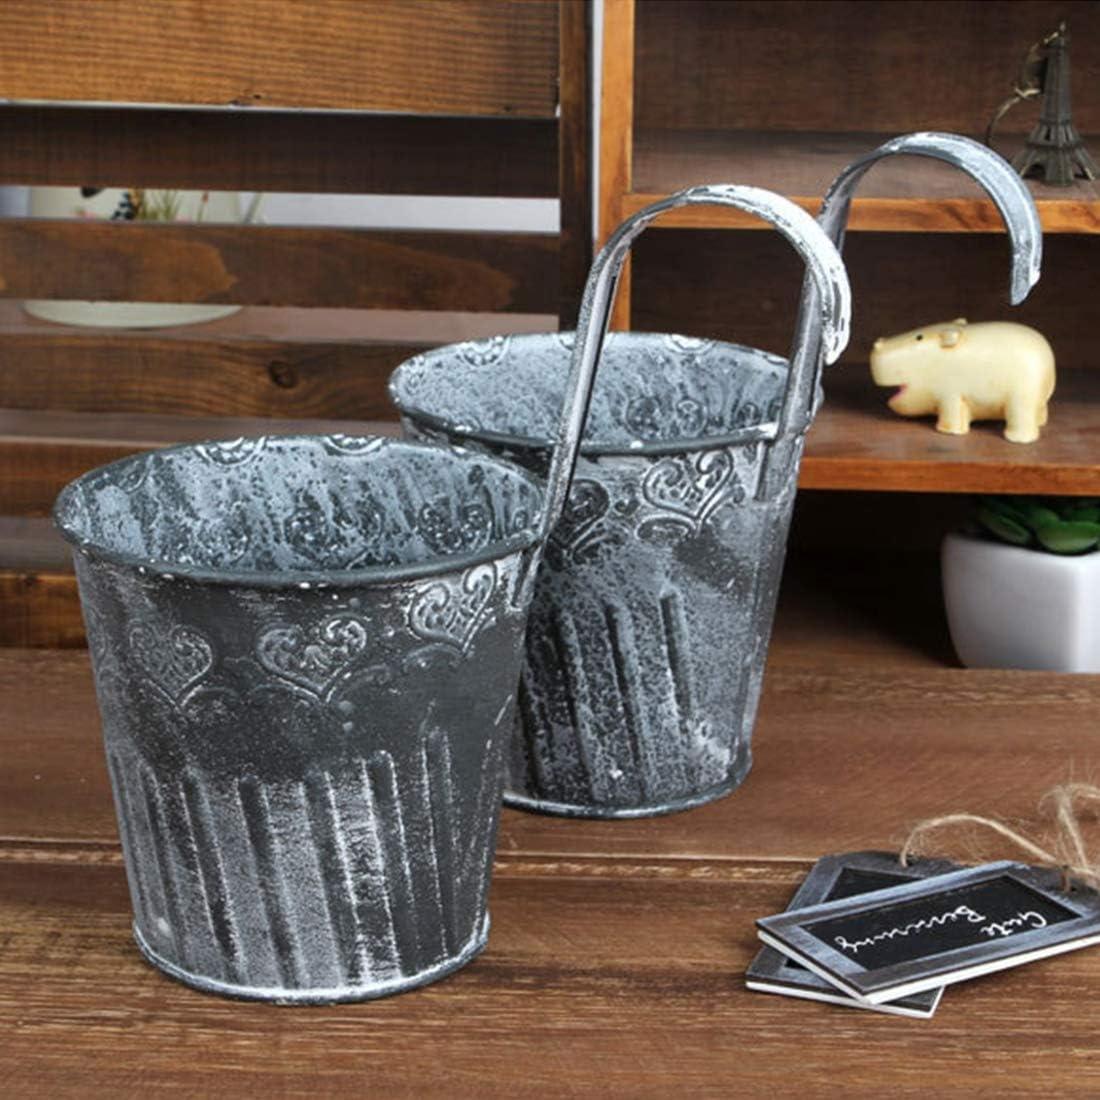 COOLAPA Macetas, 2 barriles de hierro, cubo de metal, mini cubeta para caramelos, cubos de manualidades, maceta floral